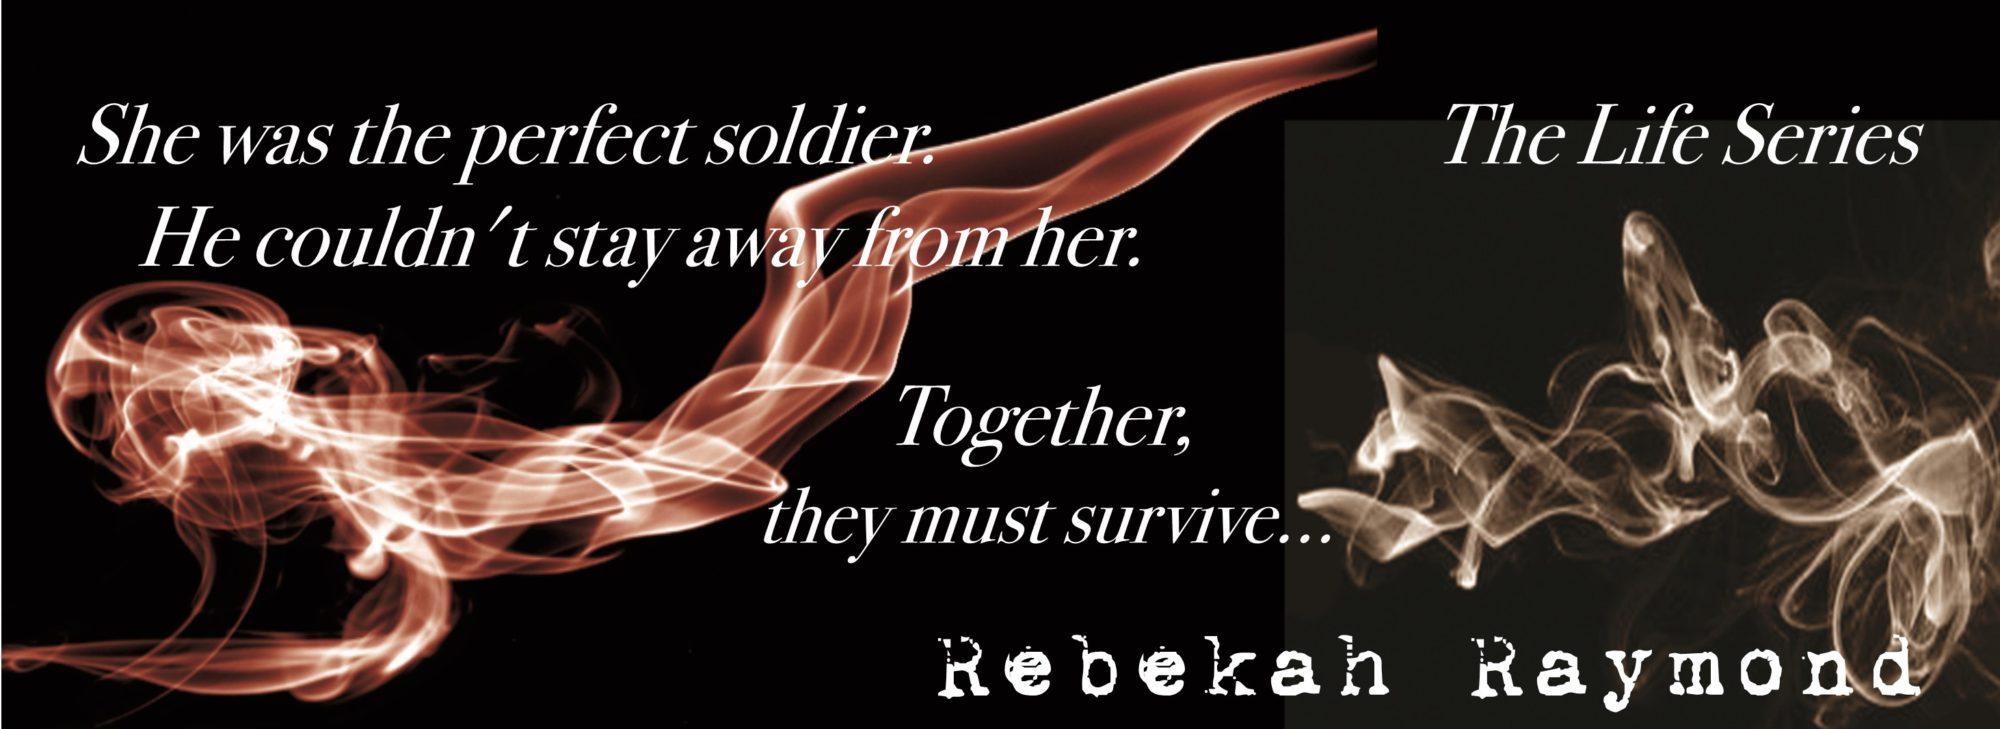 Rebekah Raymond